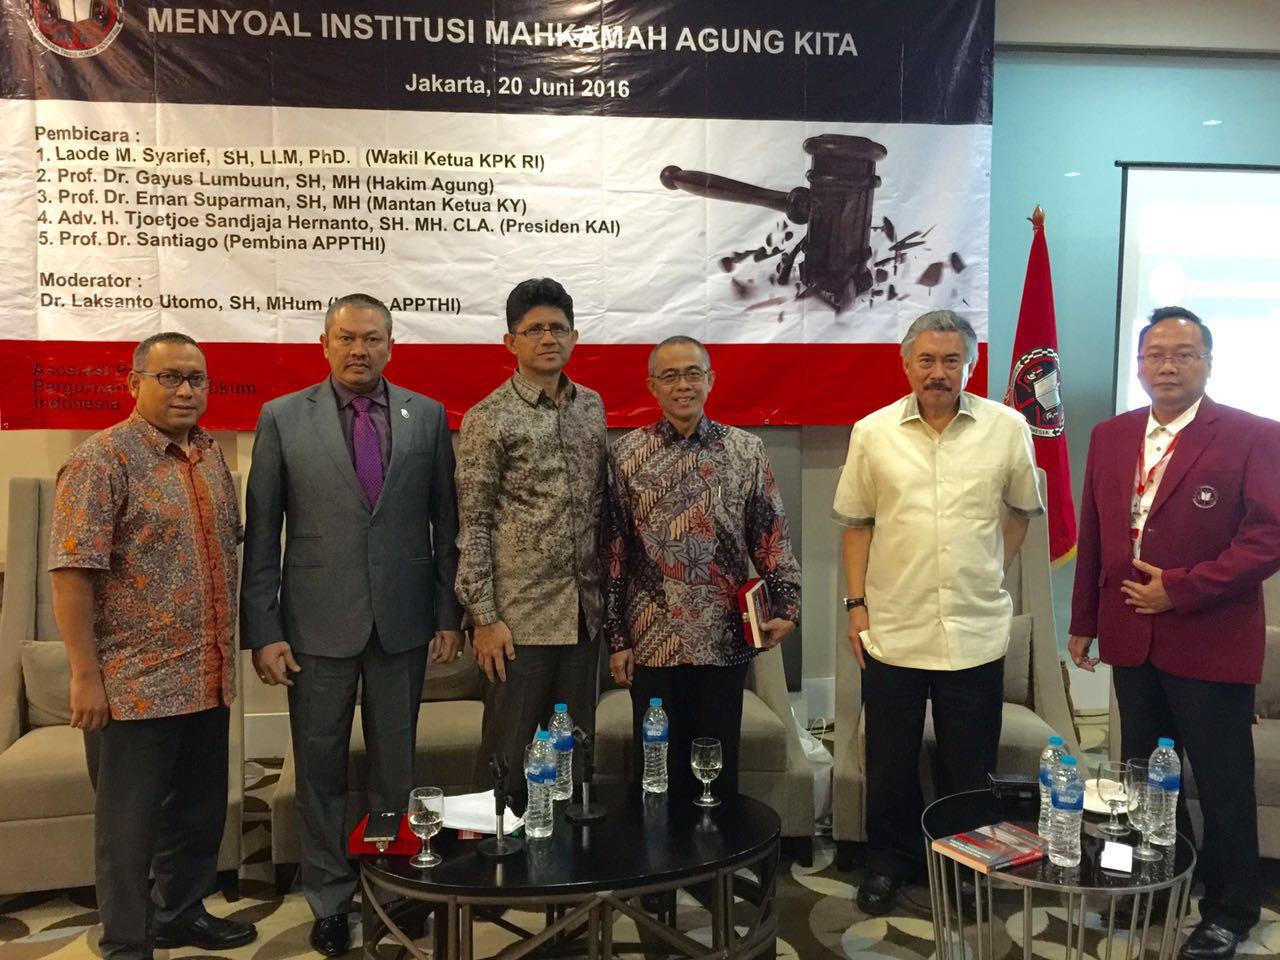 Presiden KAI bersama hakim agung Gayus Lumbun